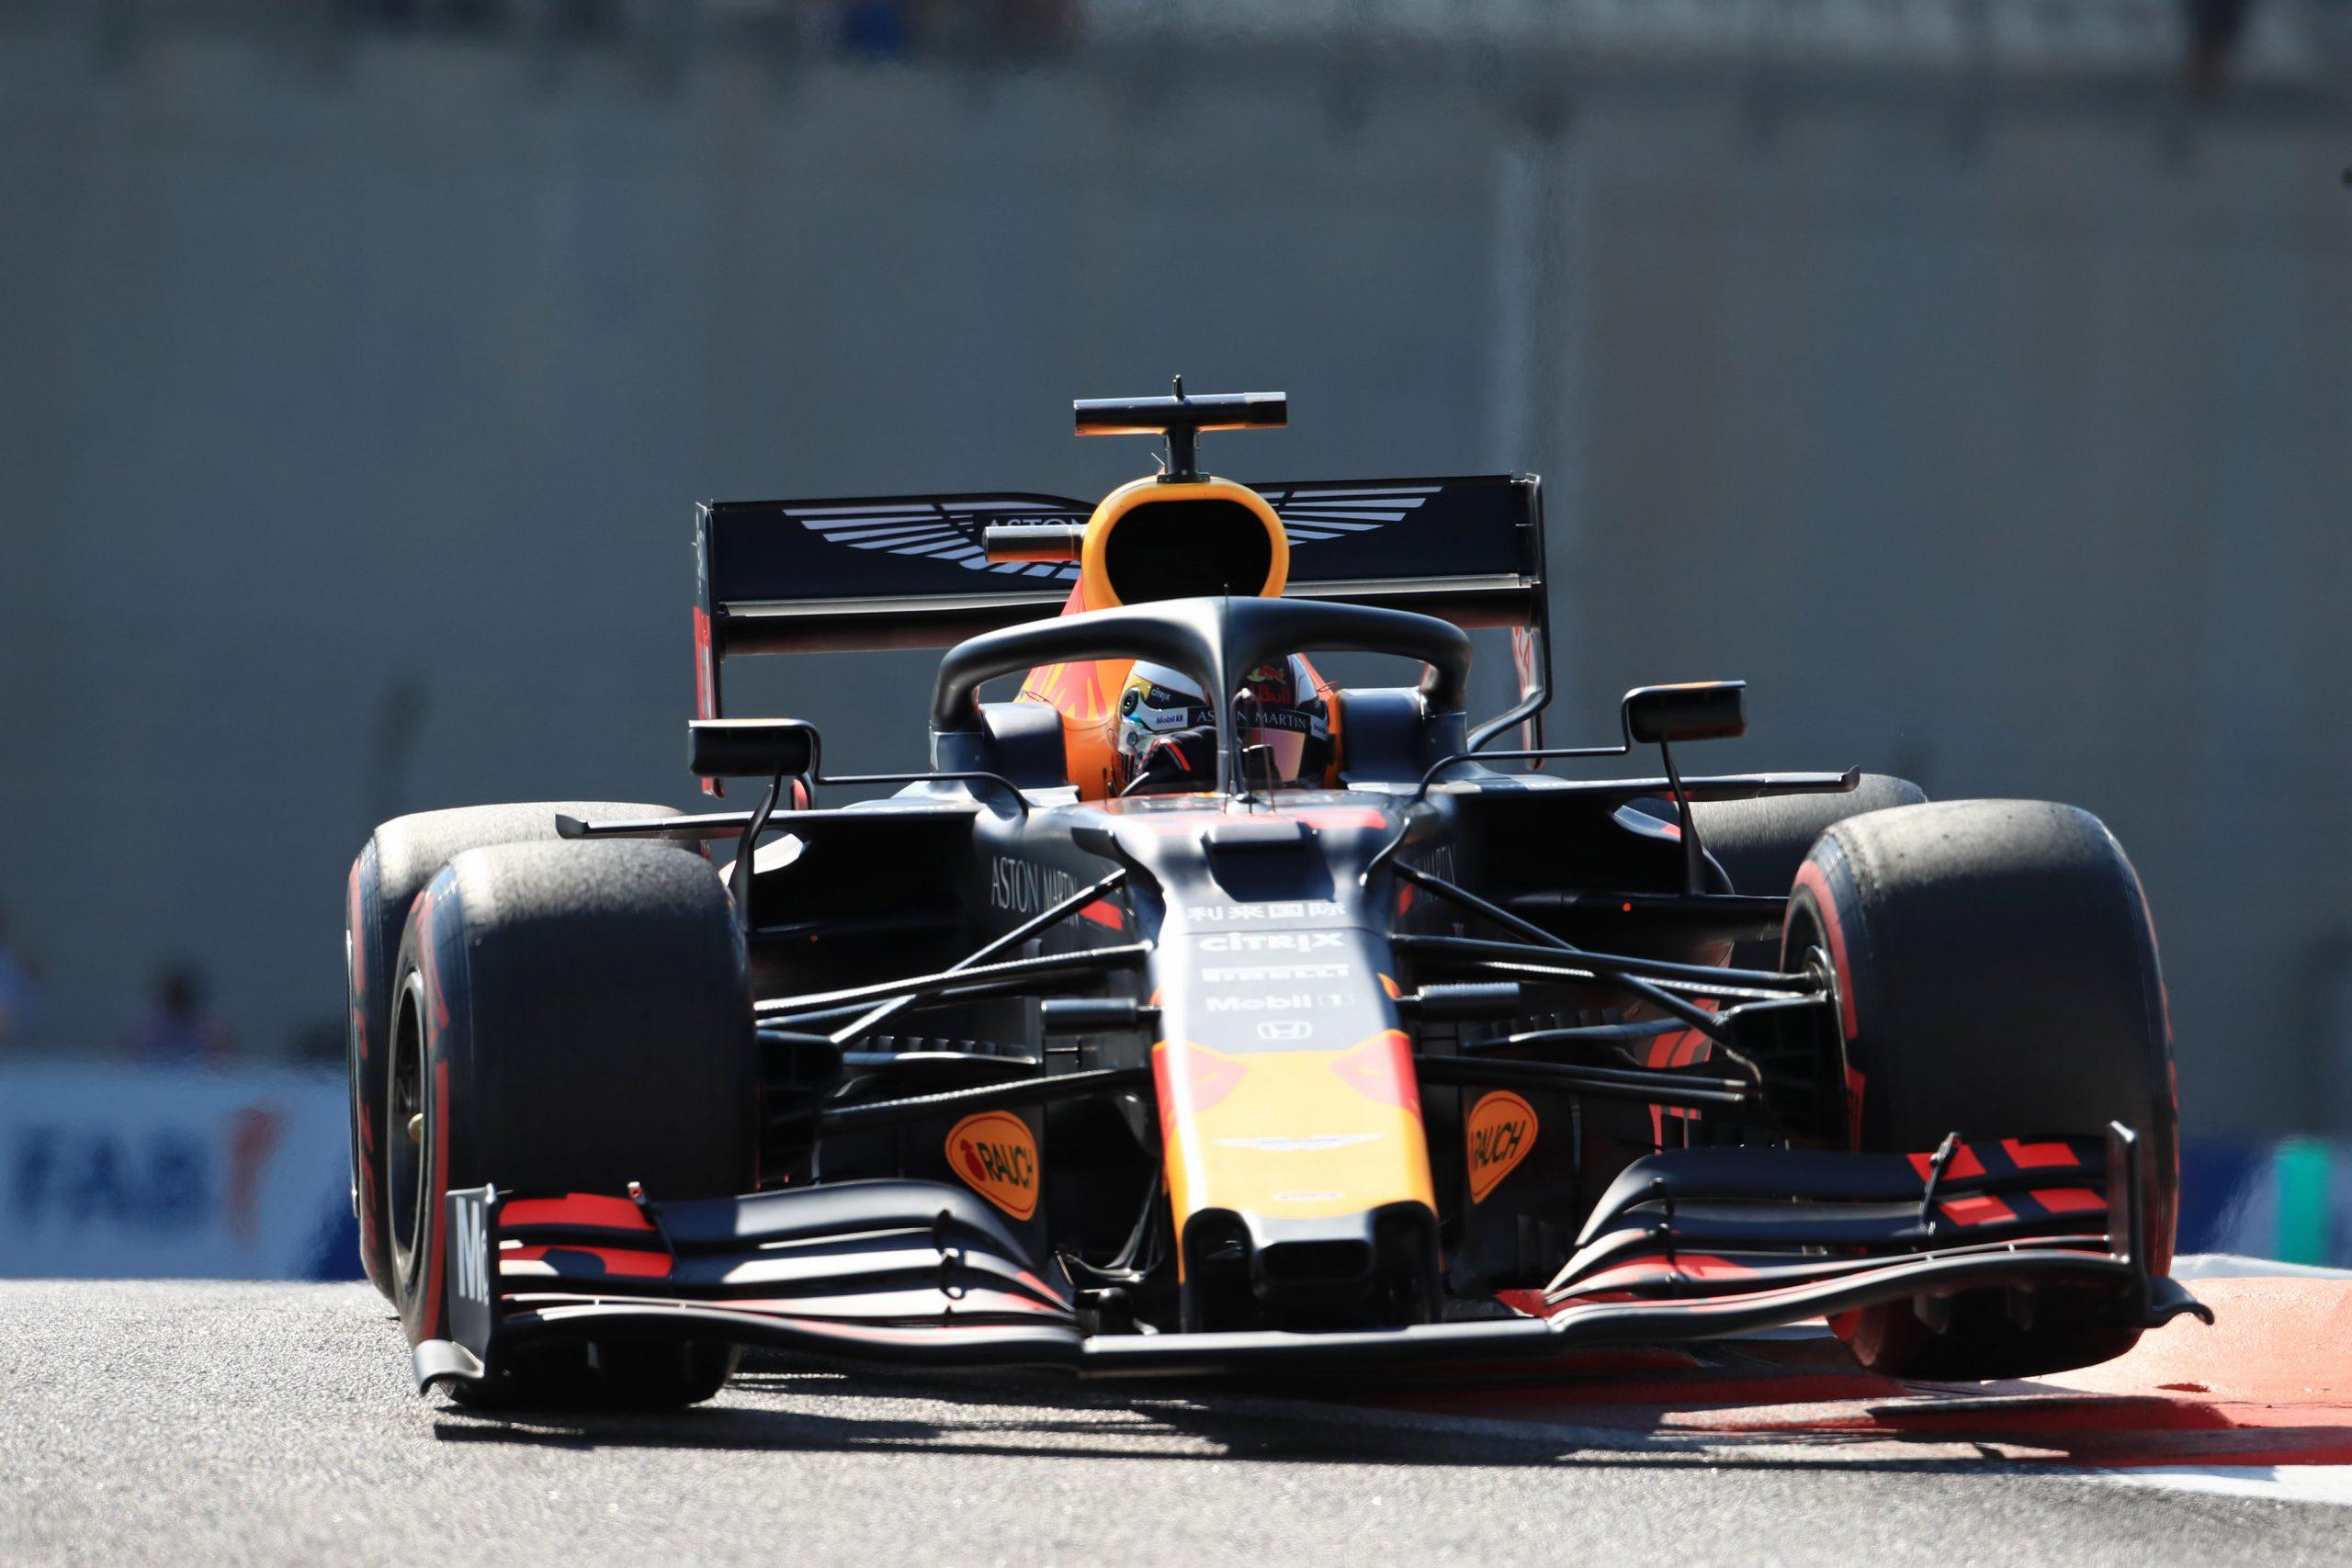 F1 Formula 1 Formula One Max Verstappen Red Bull RB15